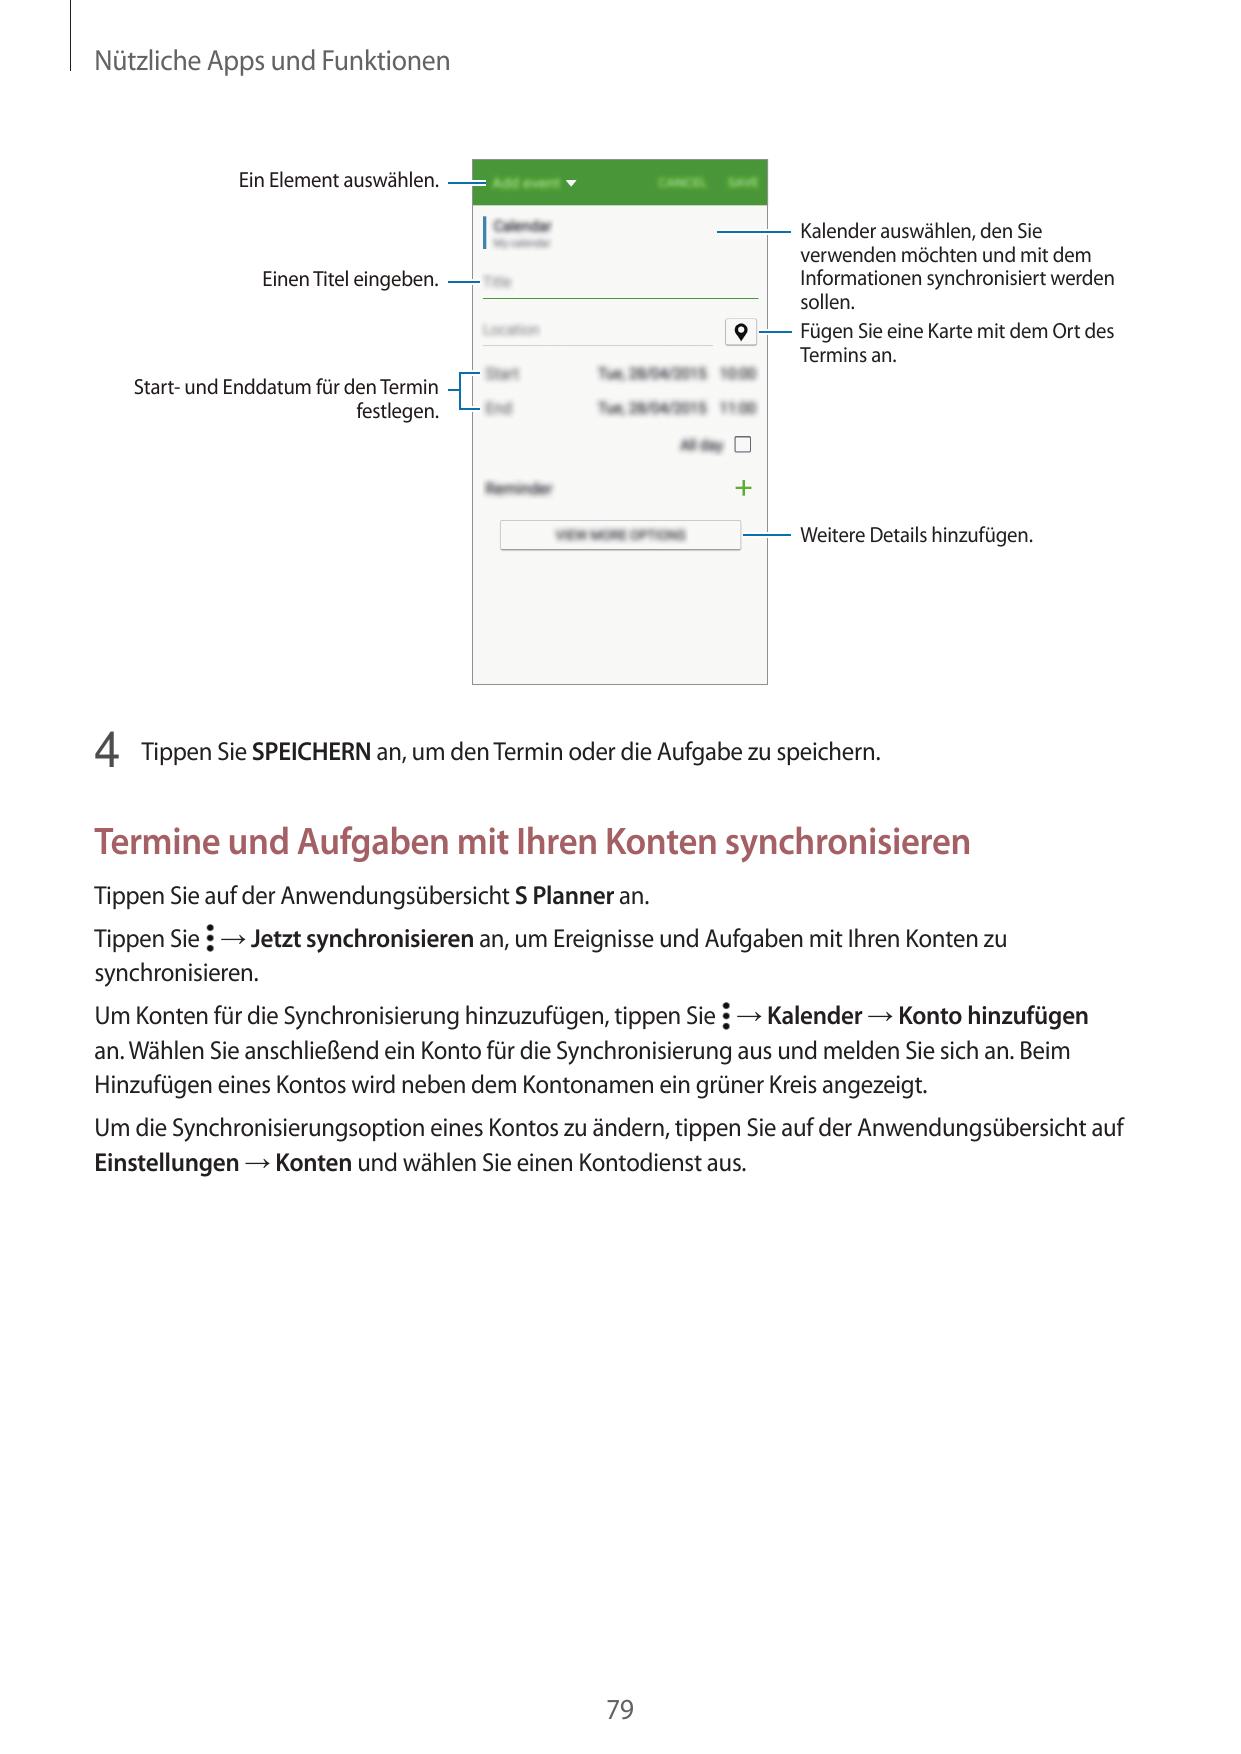 Bedienungsanleitung - Samsung Galaxy A5 - Android 5.0 - mobilcom ...